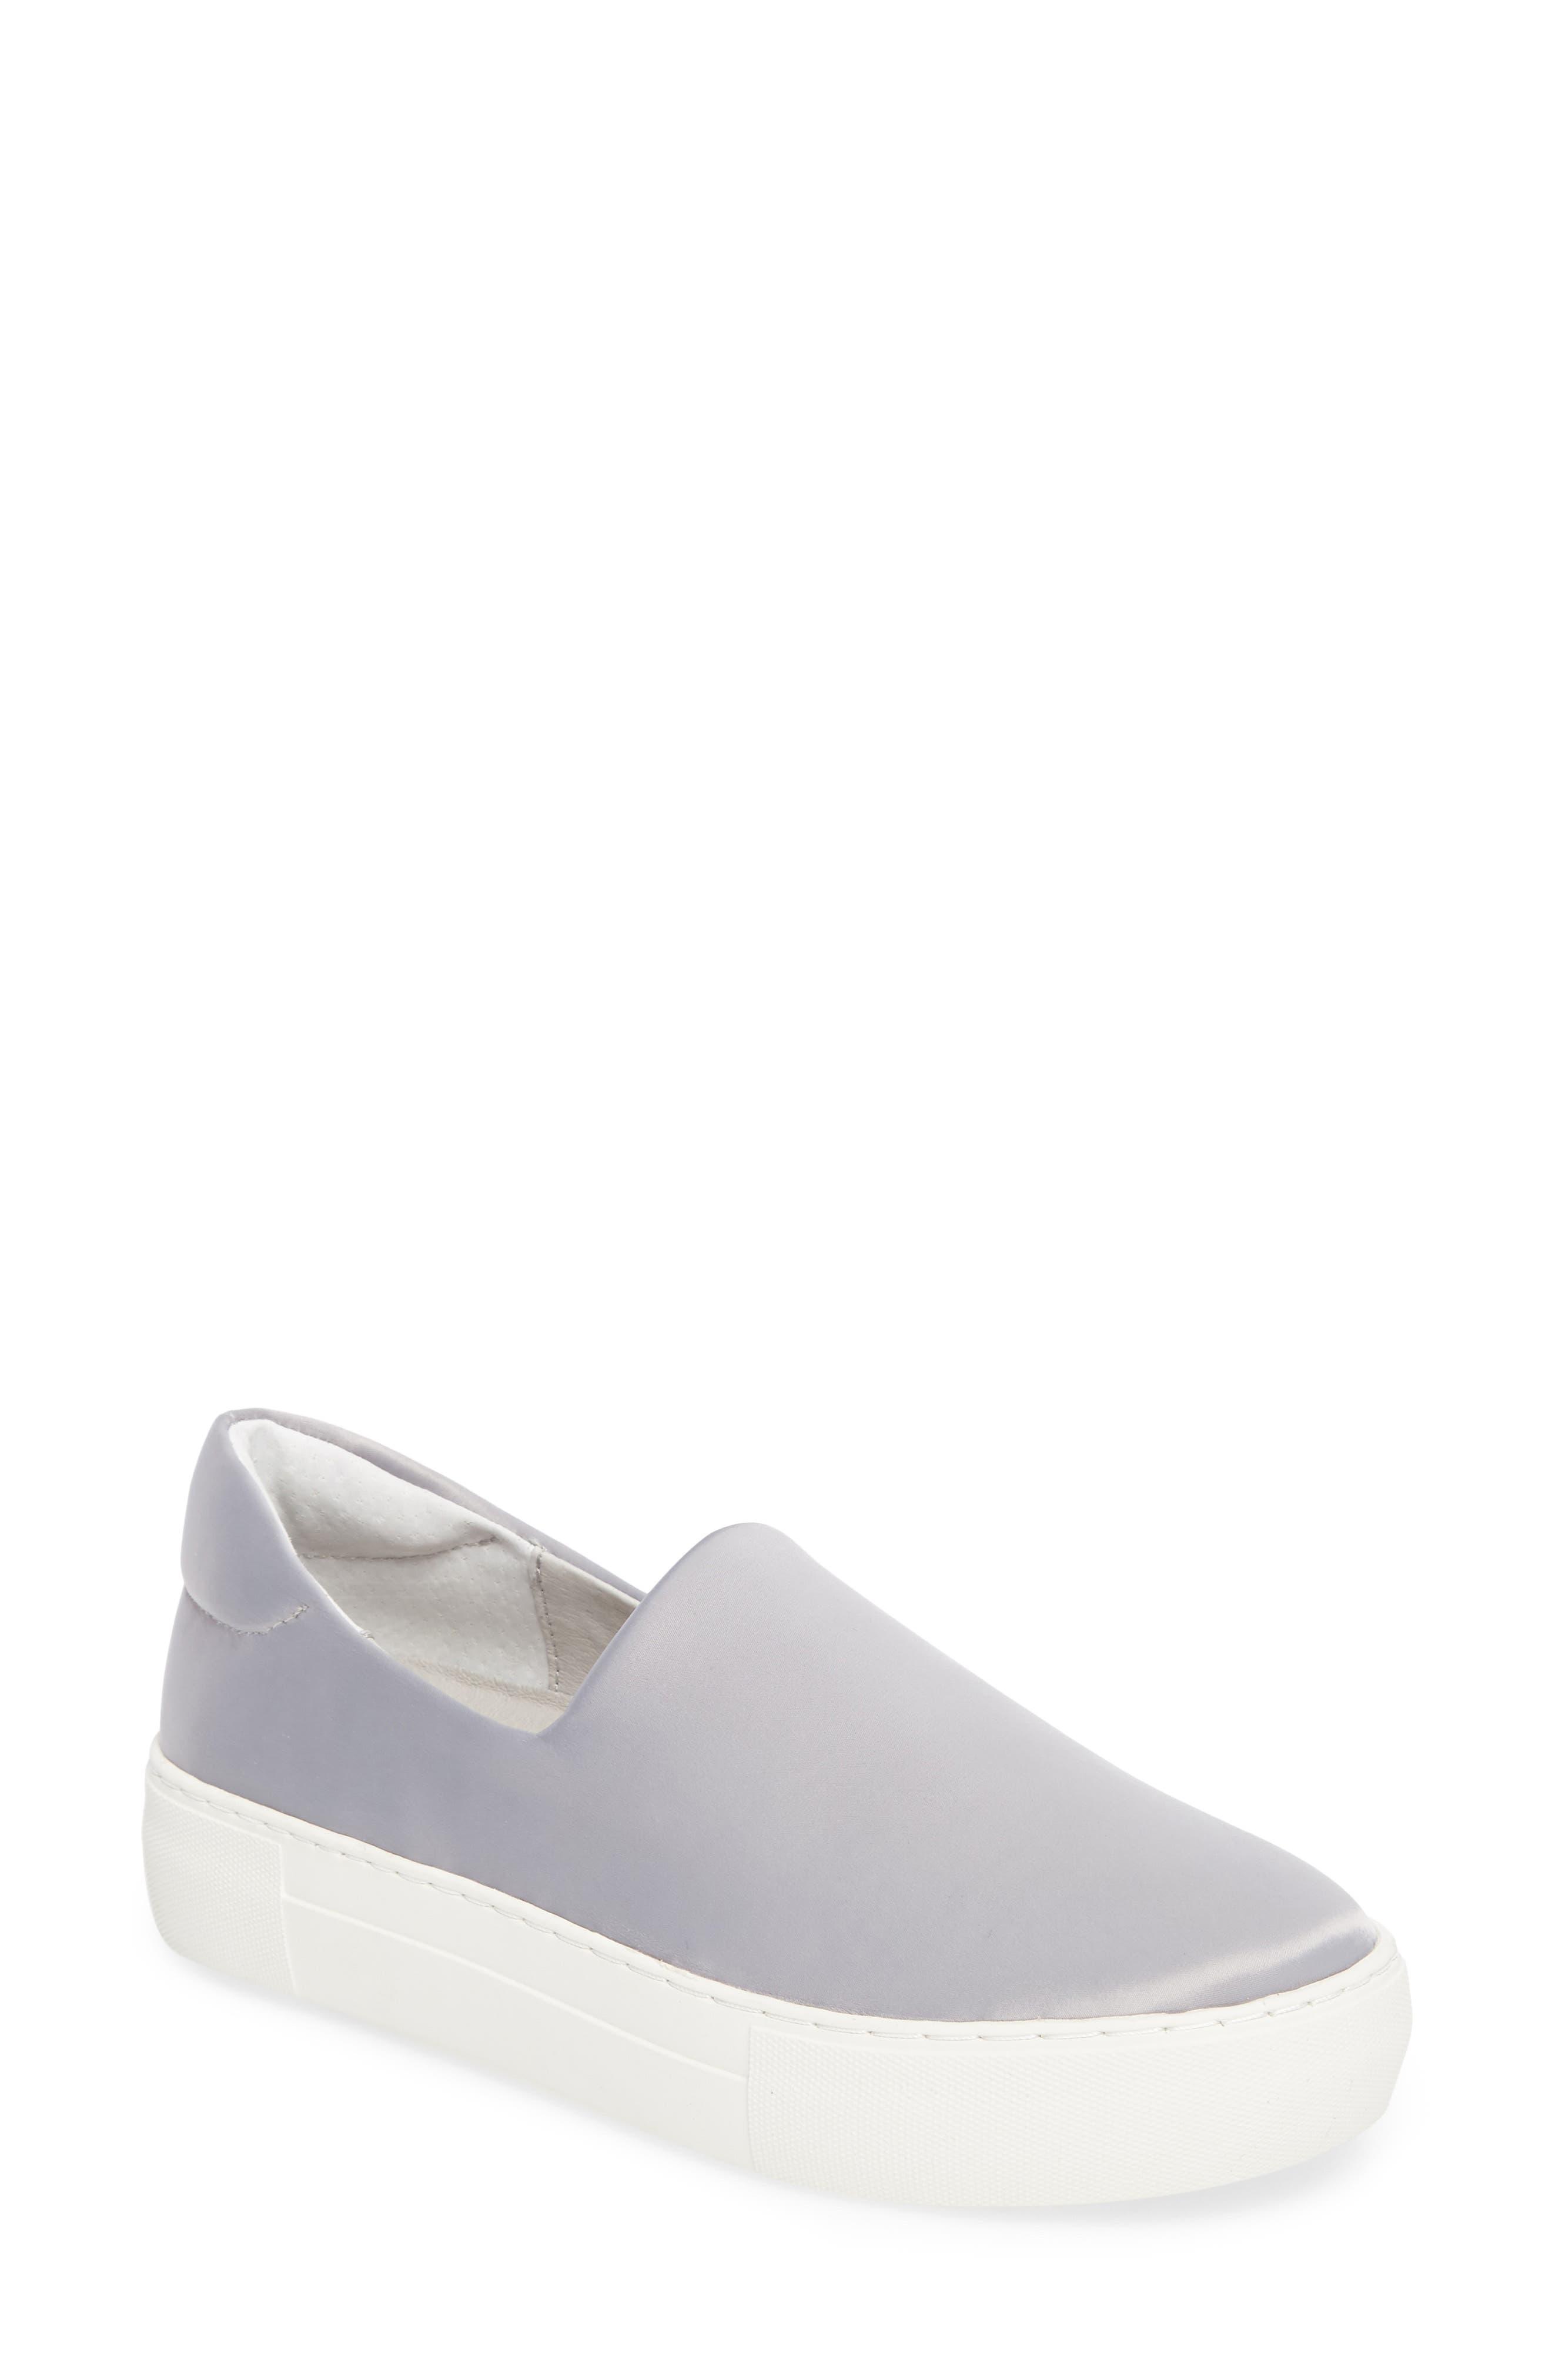 JSLIDES Abba Slip-On Platform Sneaker